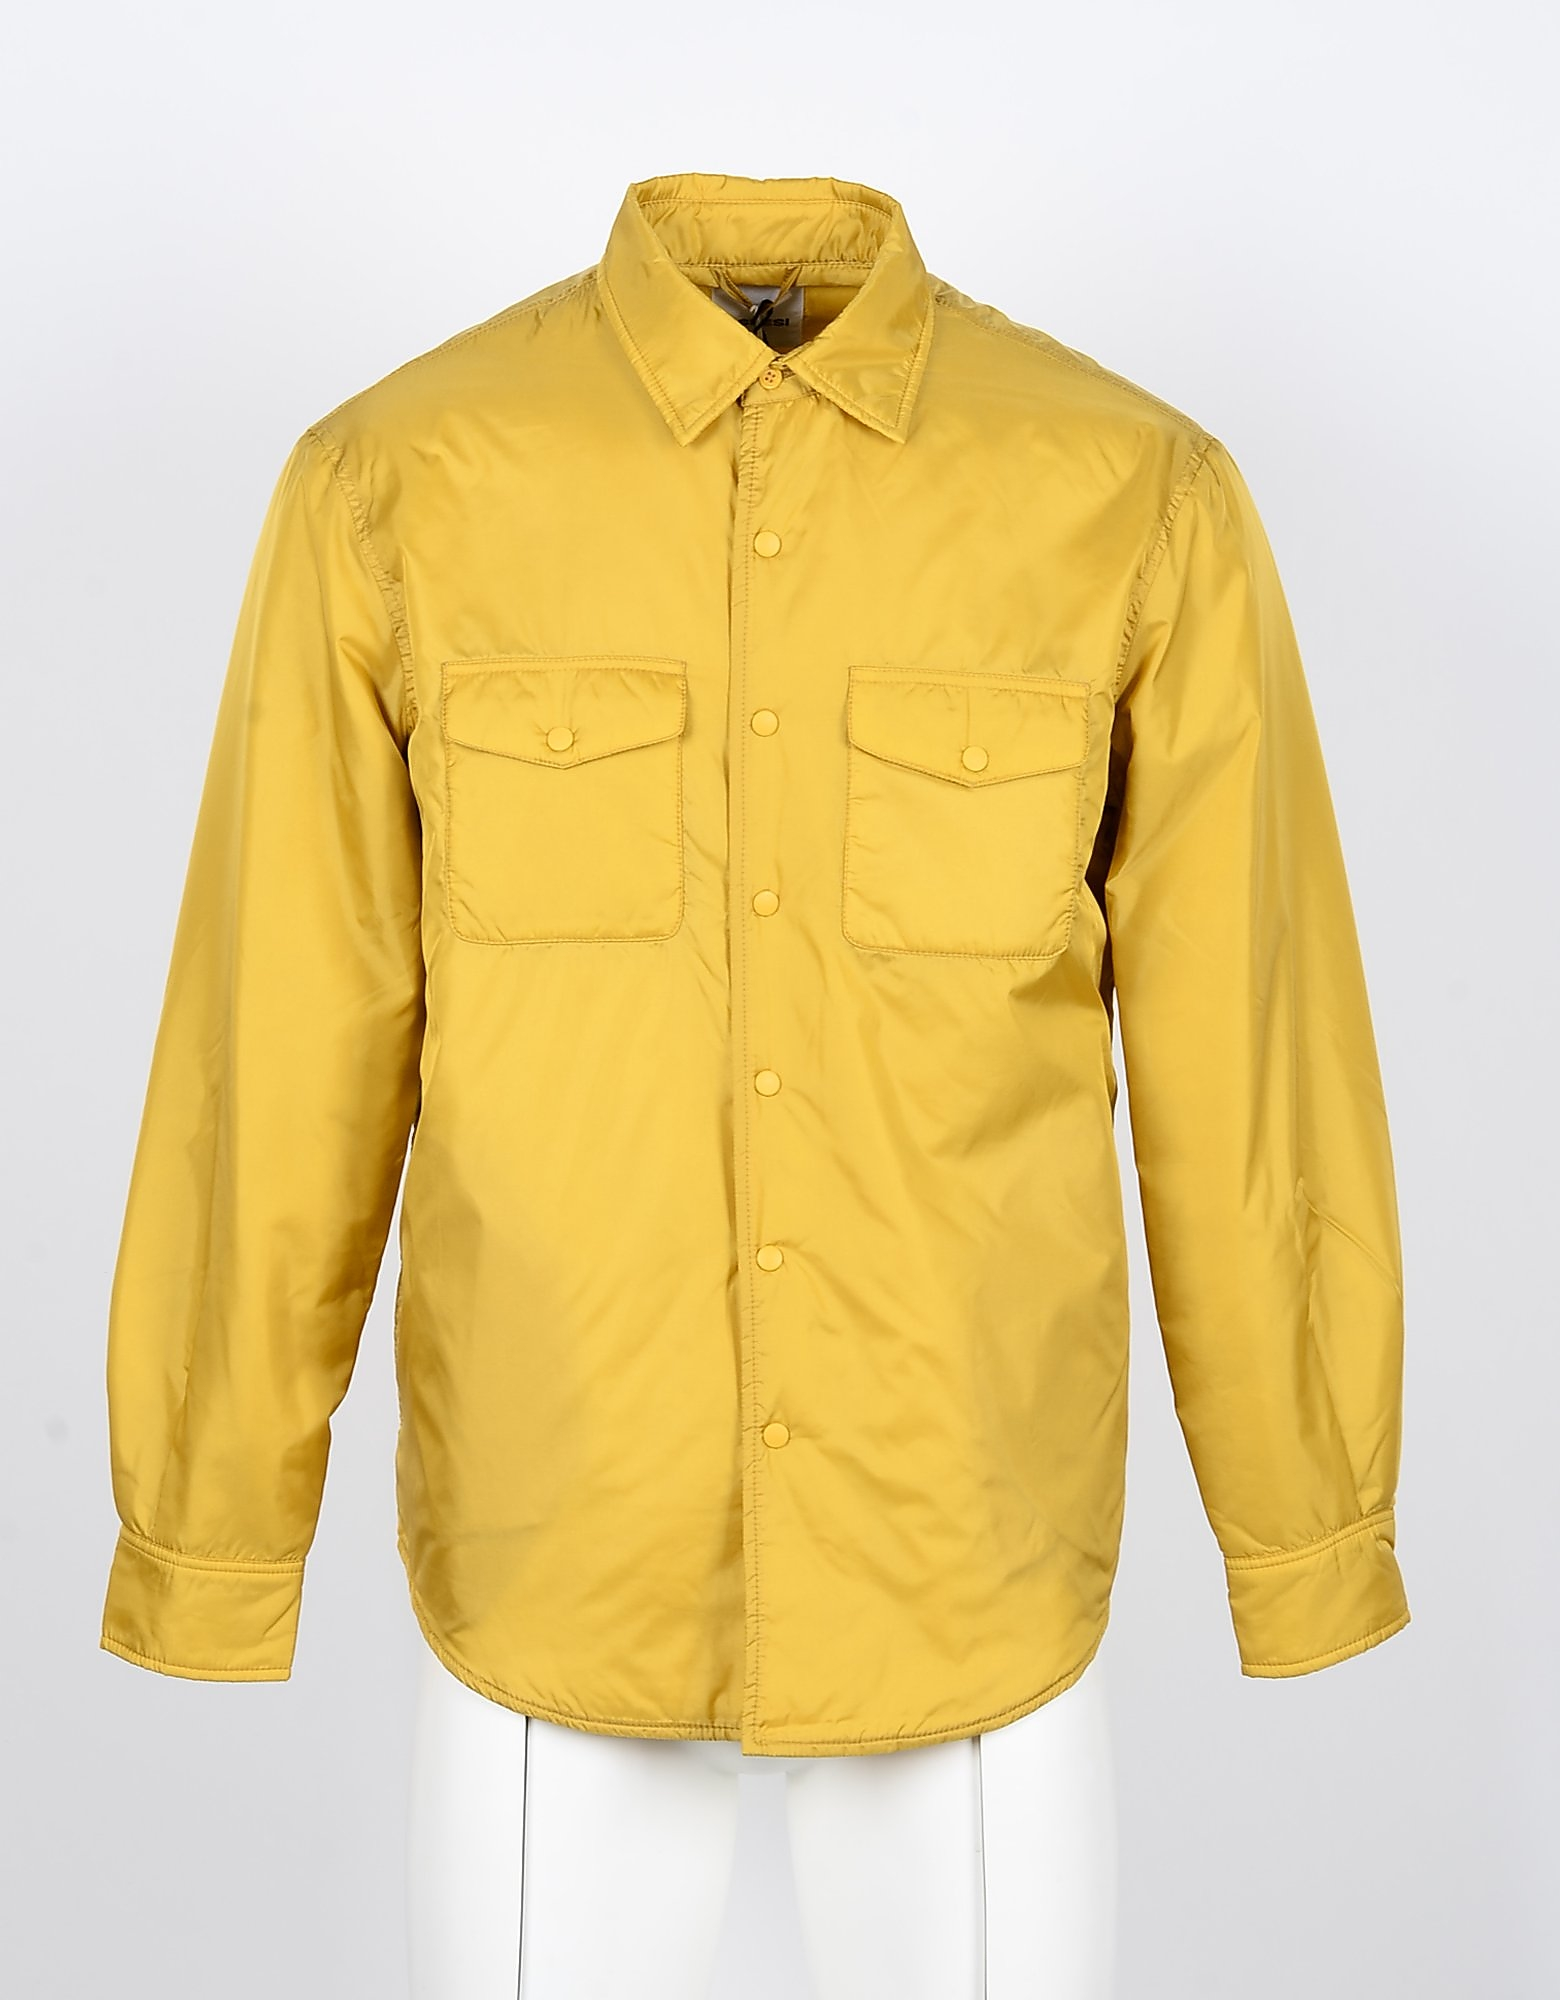 Aspesi Designer Shirts, Yellow Men's Shirt